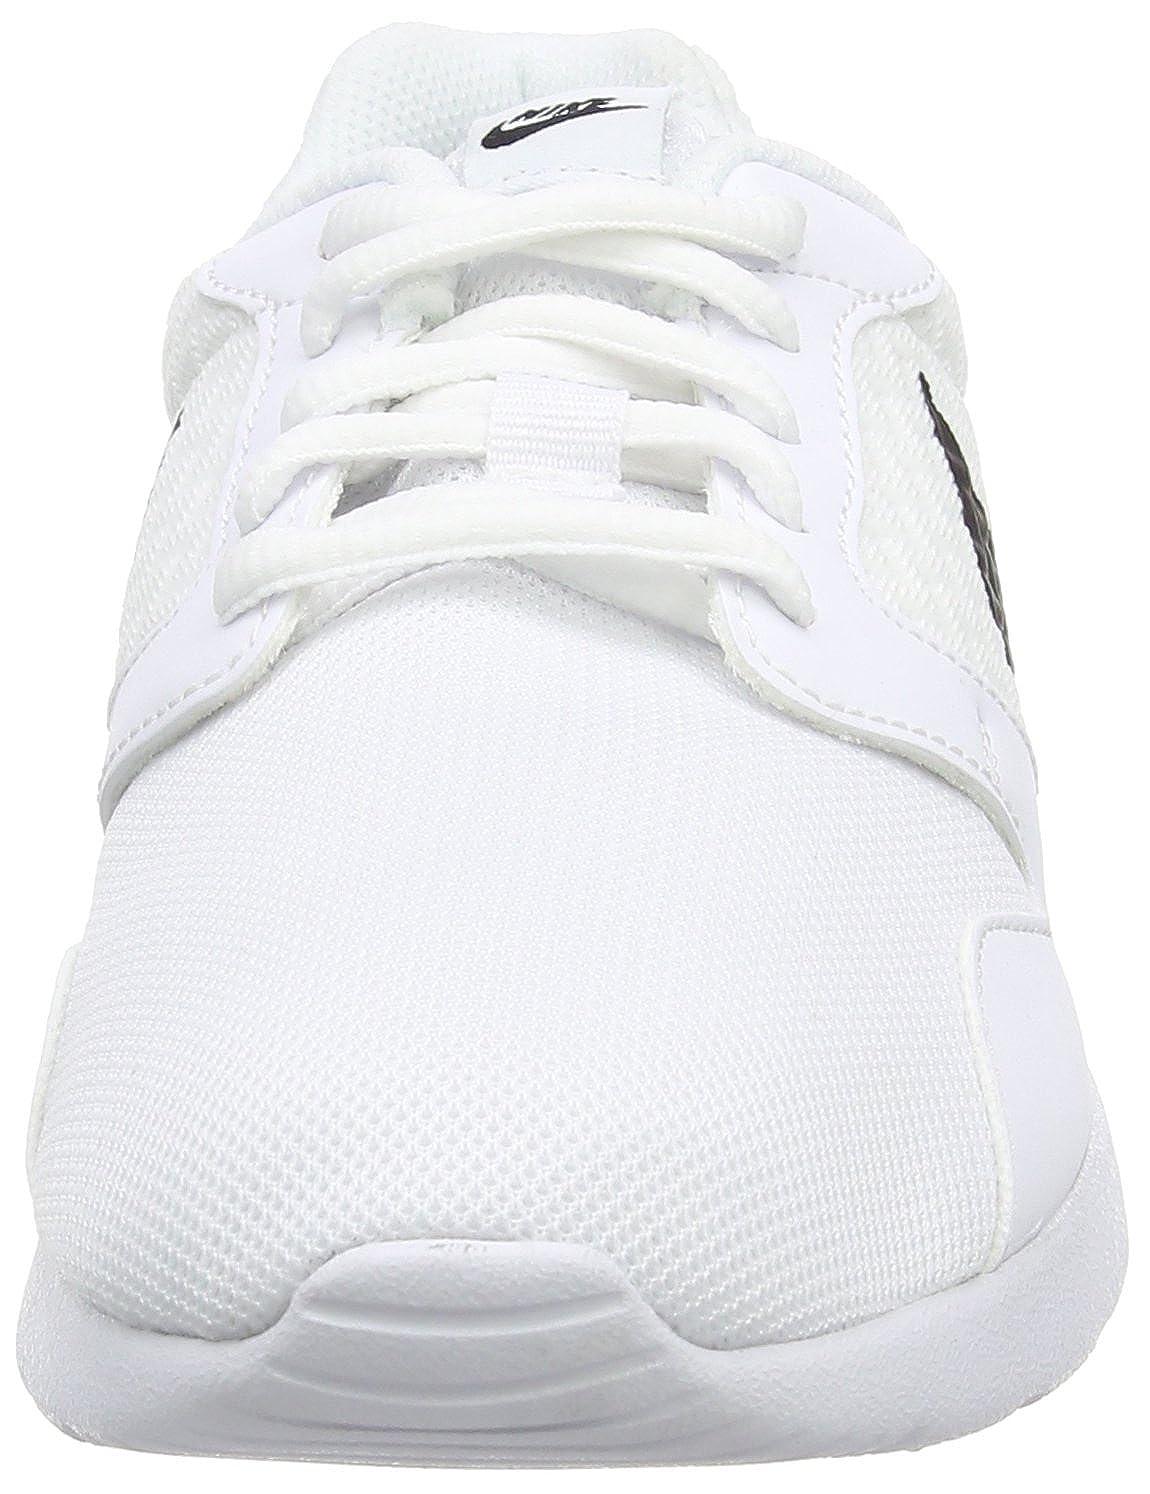 the best attitude 1033b d918f Nike Kaishi, Women s Trainers Black  Nike  Amazon.ca  Shoes   Handbags